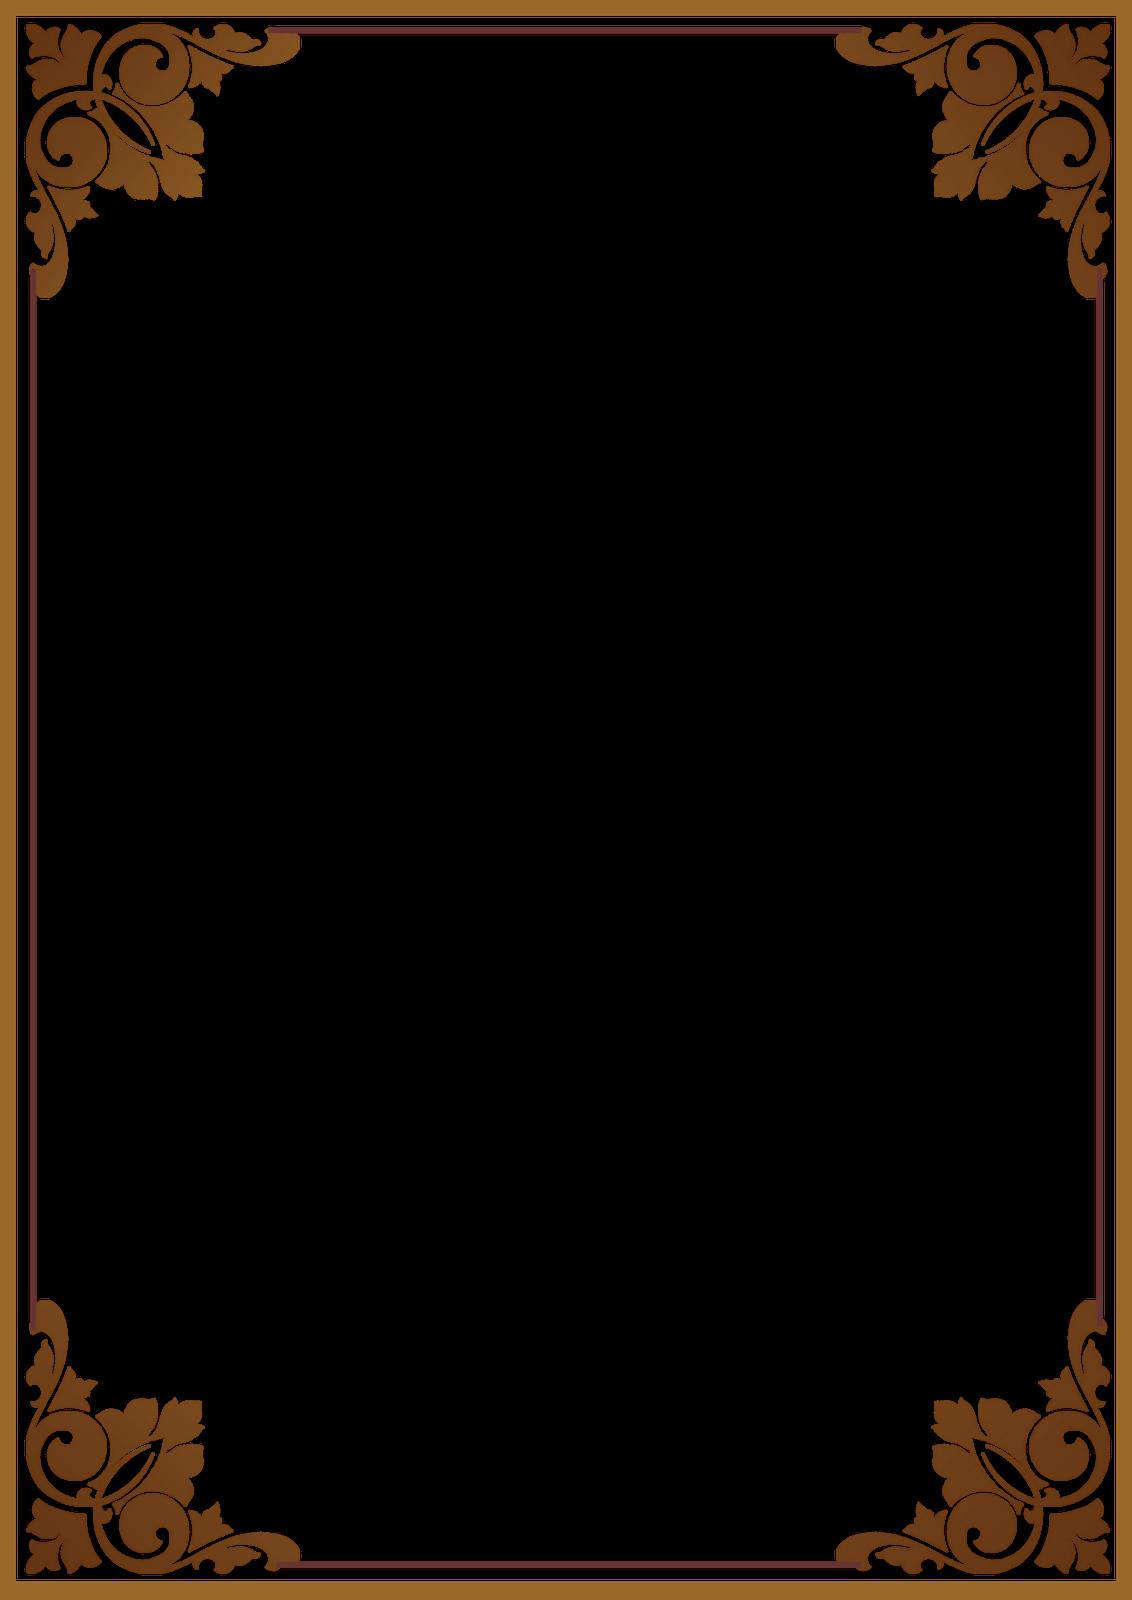 Bingkai Frame Png : bingkai, frame, Bingkai, Batik, Clipart, Transparent, Large, Images, Clipart,